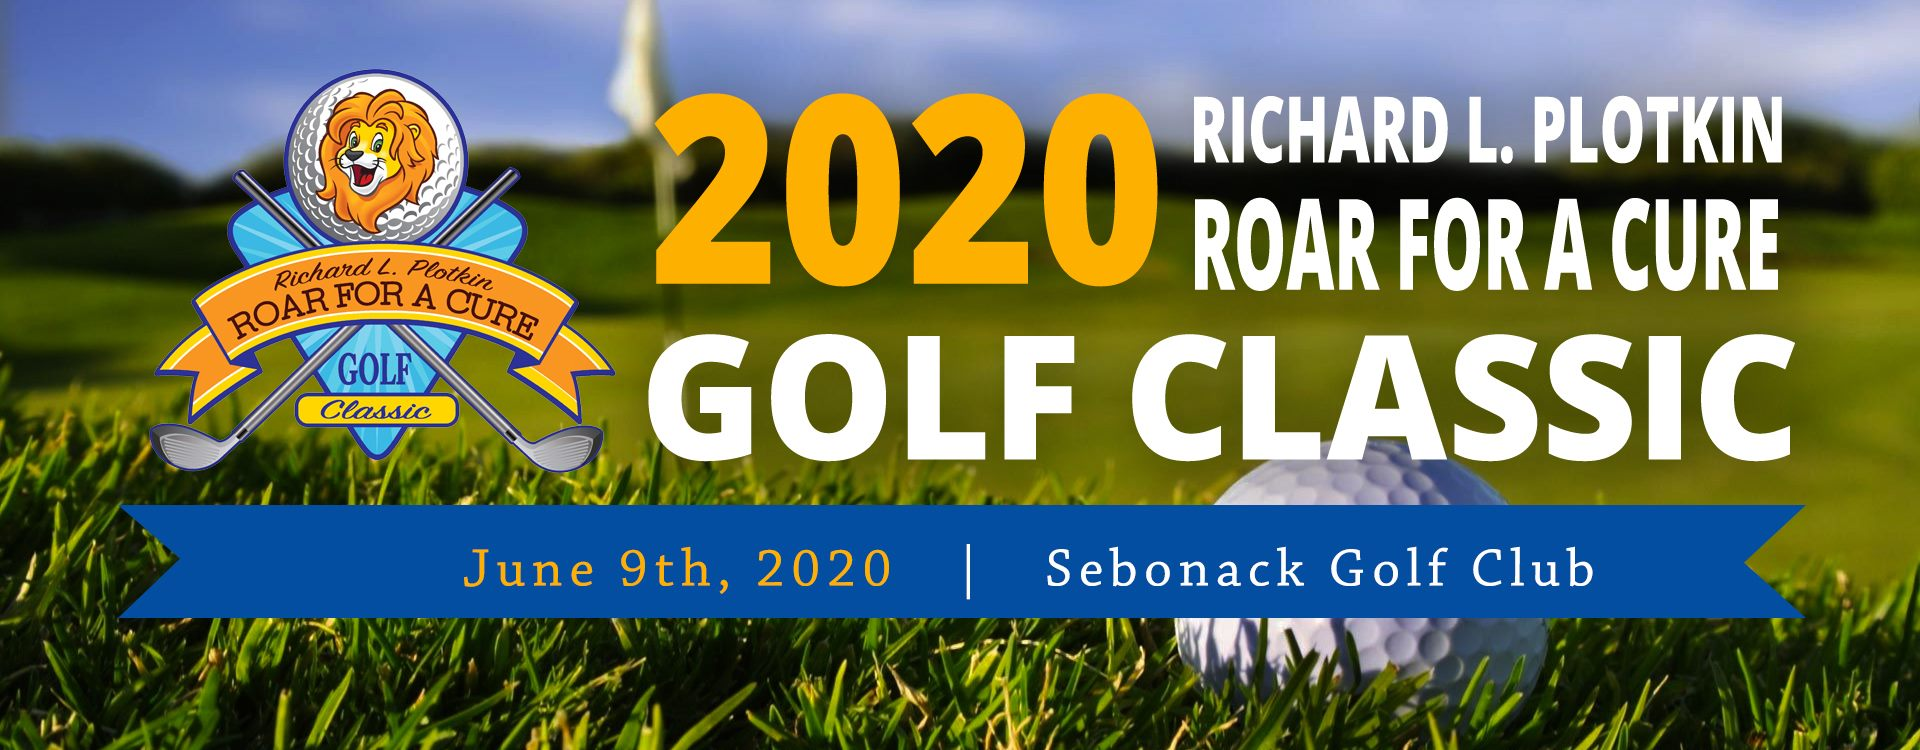 3rd Annual Richard L. Plotkin Roar For A Cure Golf Classic